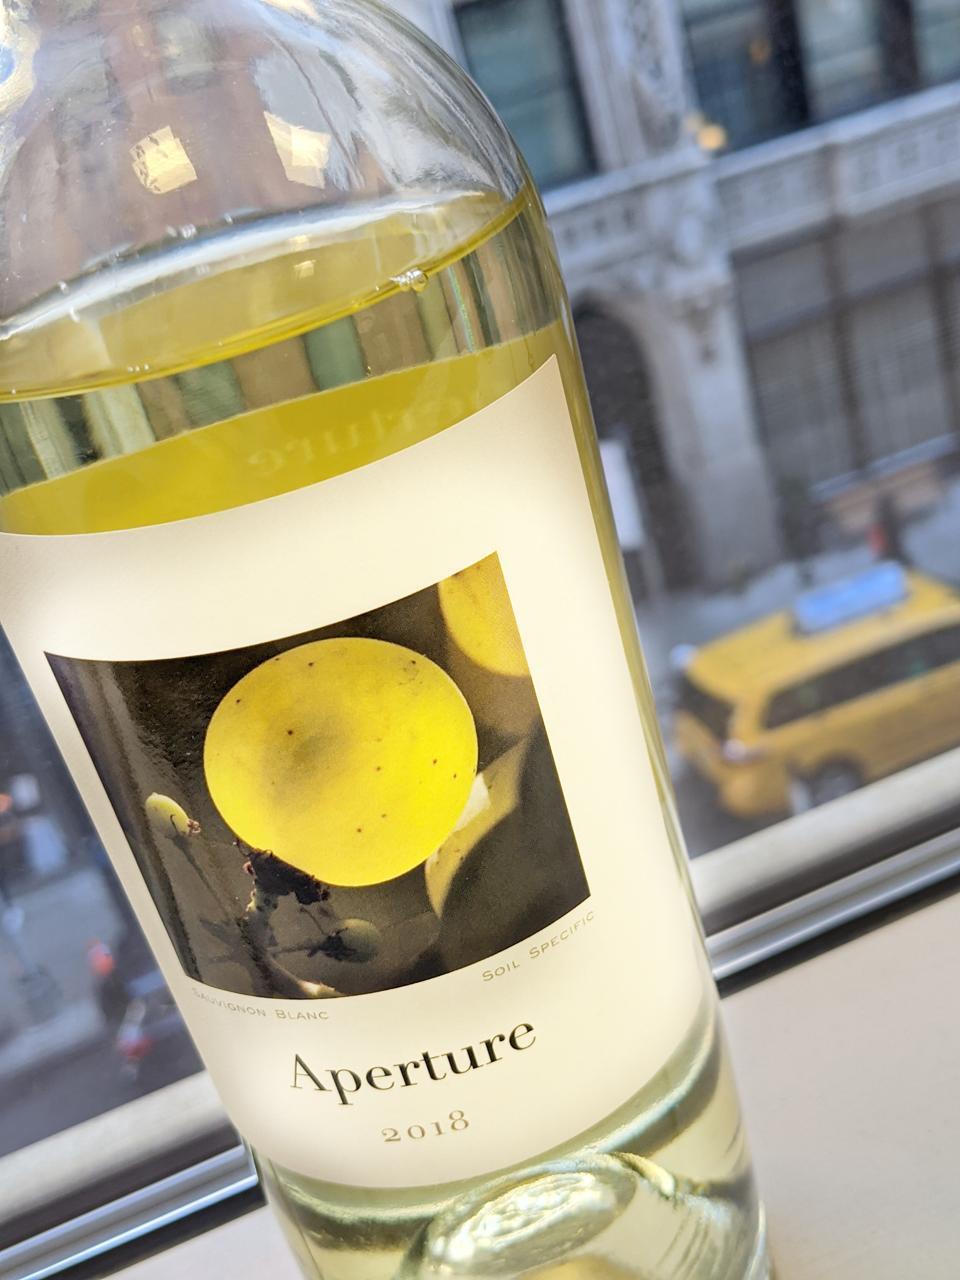 2018 Aperture Sauvignon Blanc